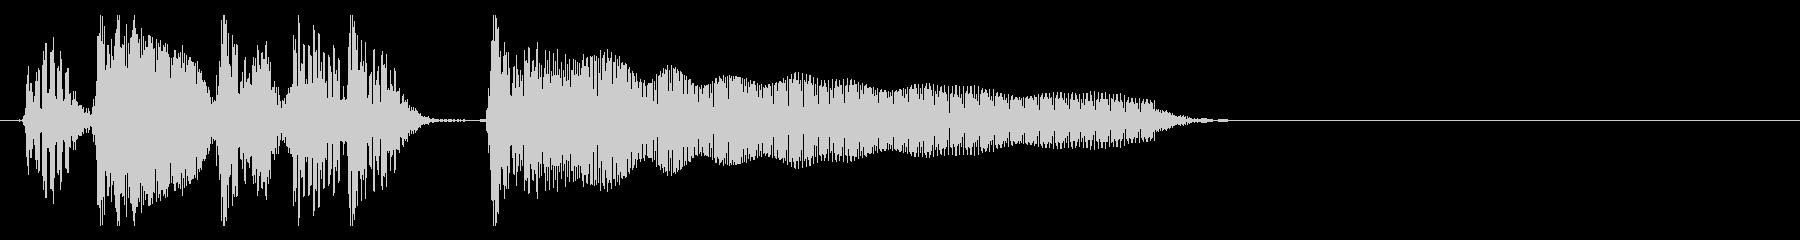 JAZZ BASS 切り替え場面用の未再生の波形